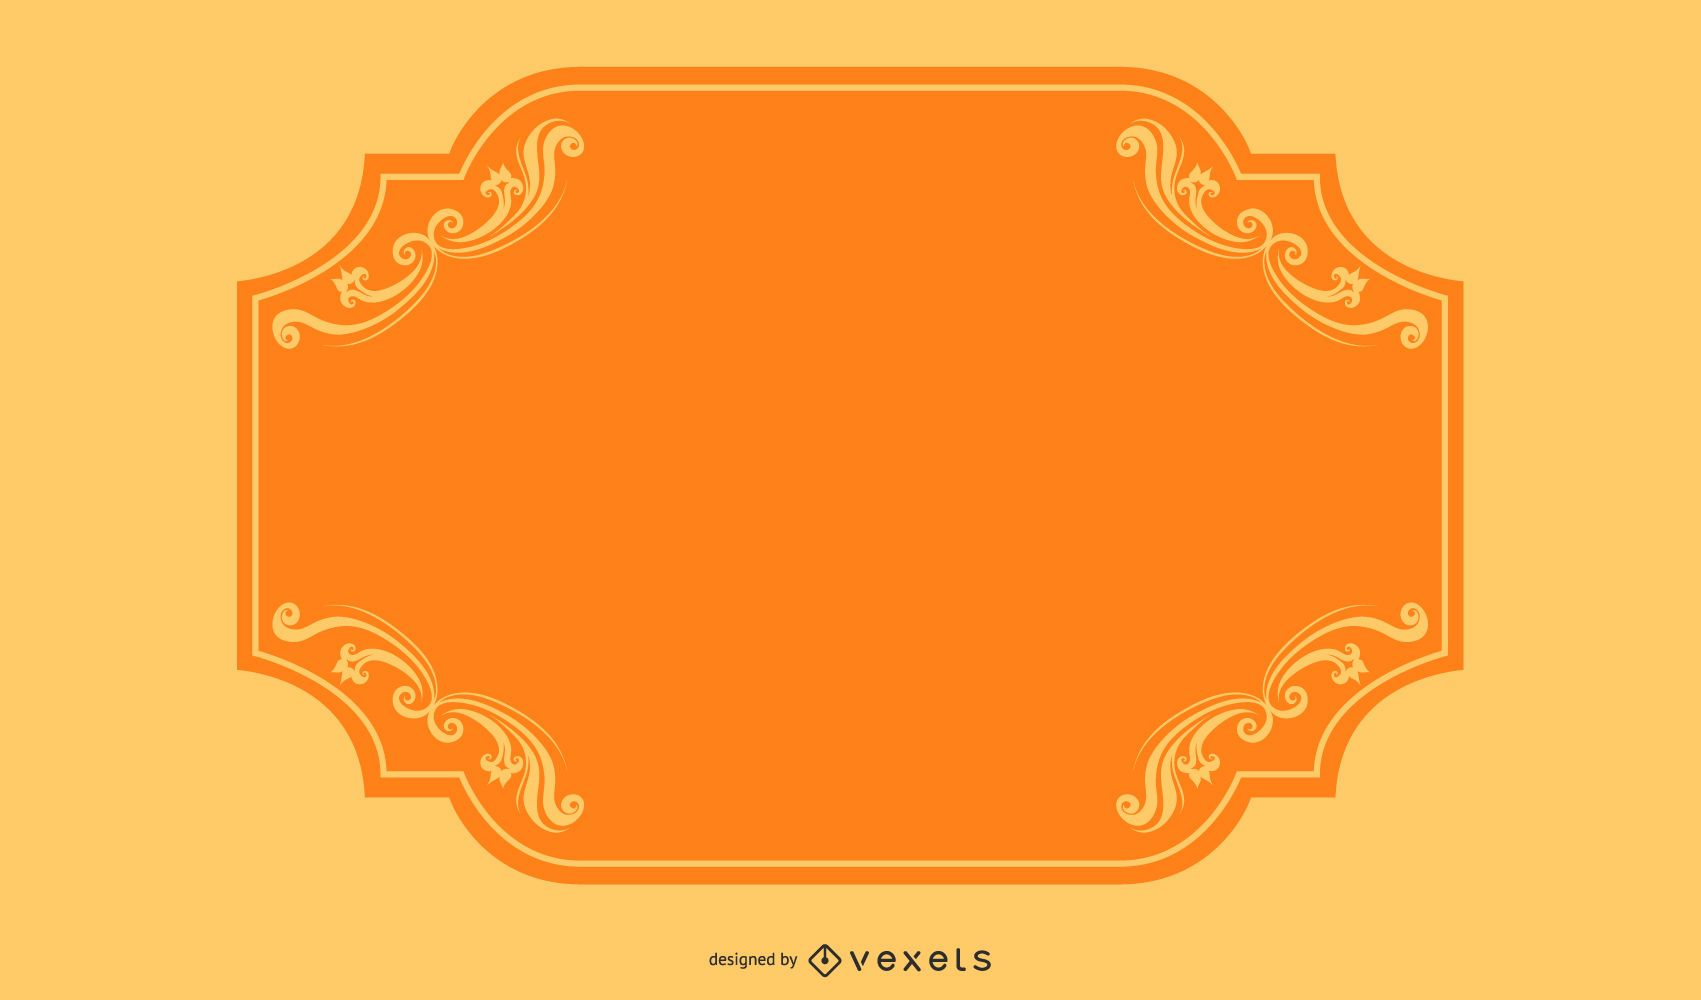 Colorful Swirls Orange Border Banner